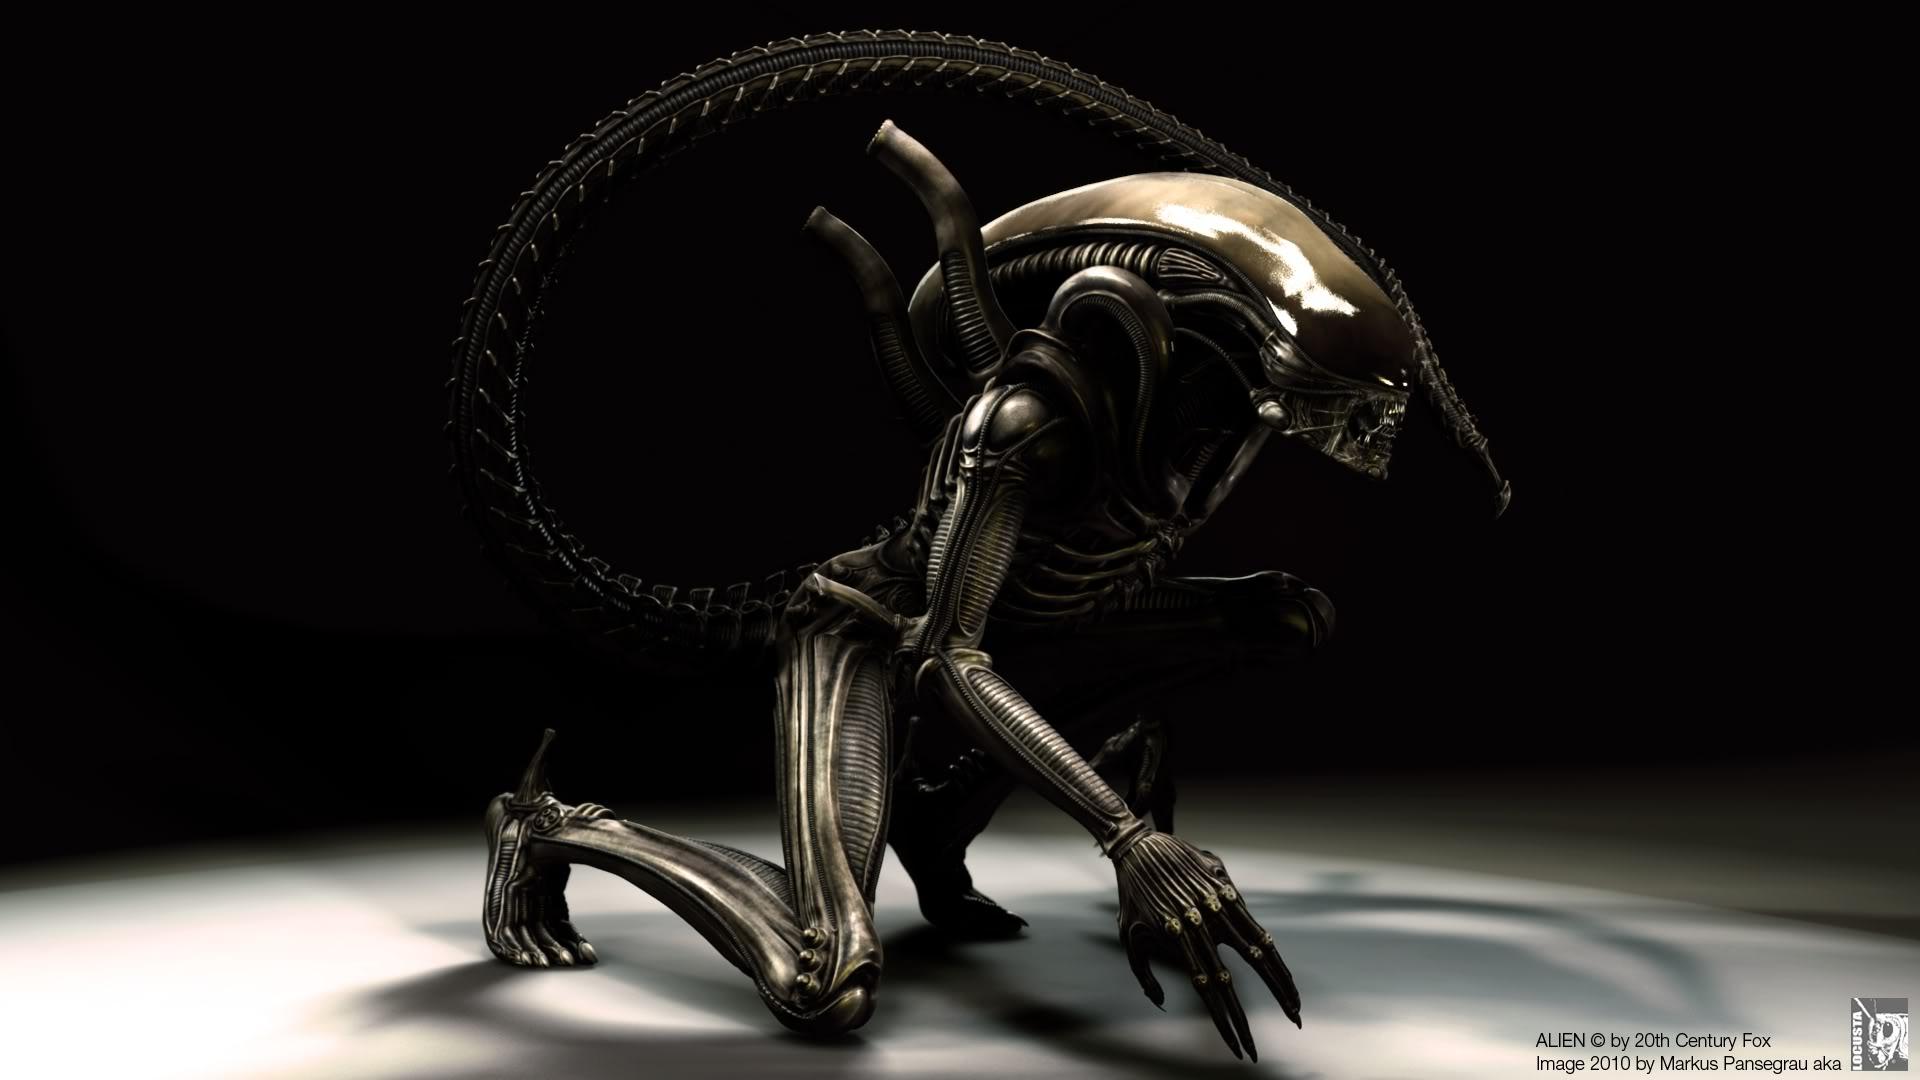 3D Alien   Wallpaper 30796 1920x1080